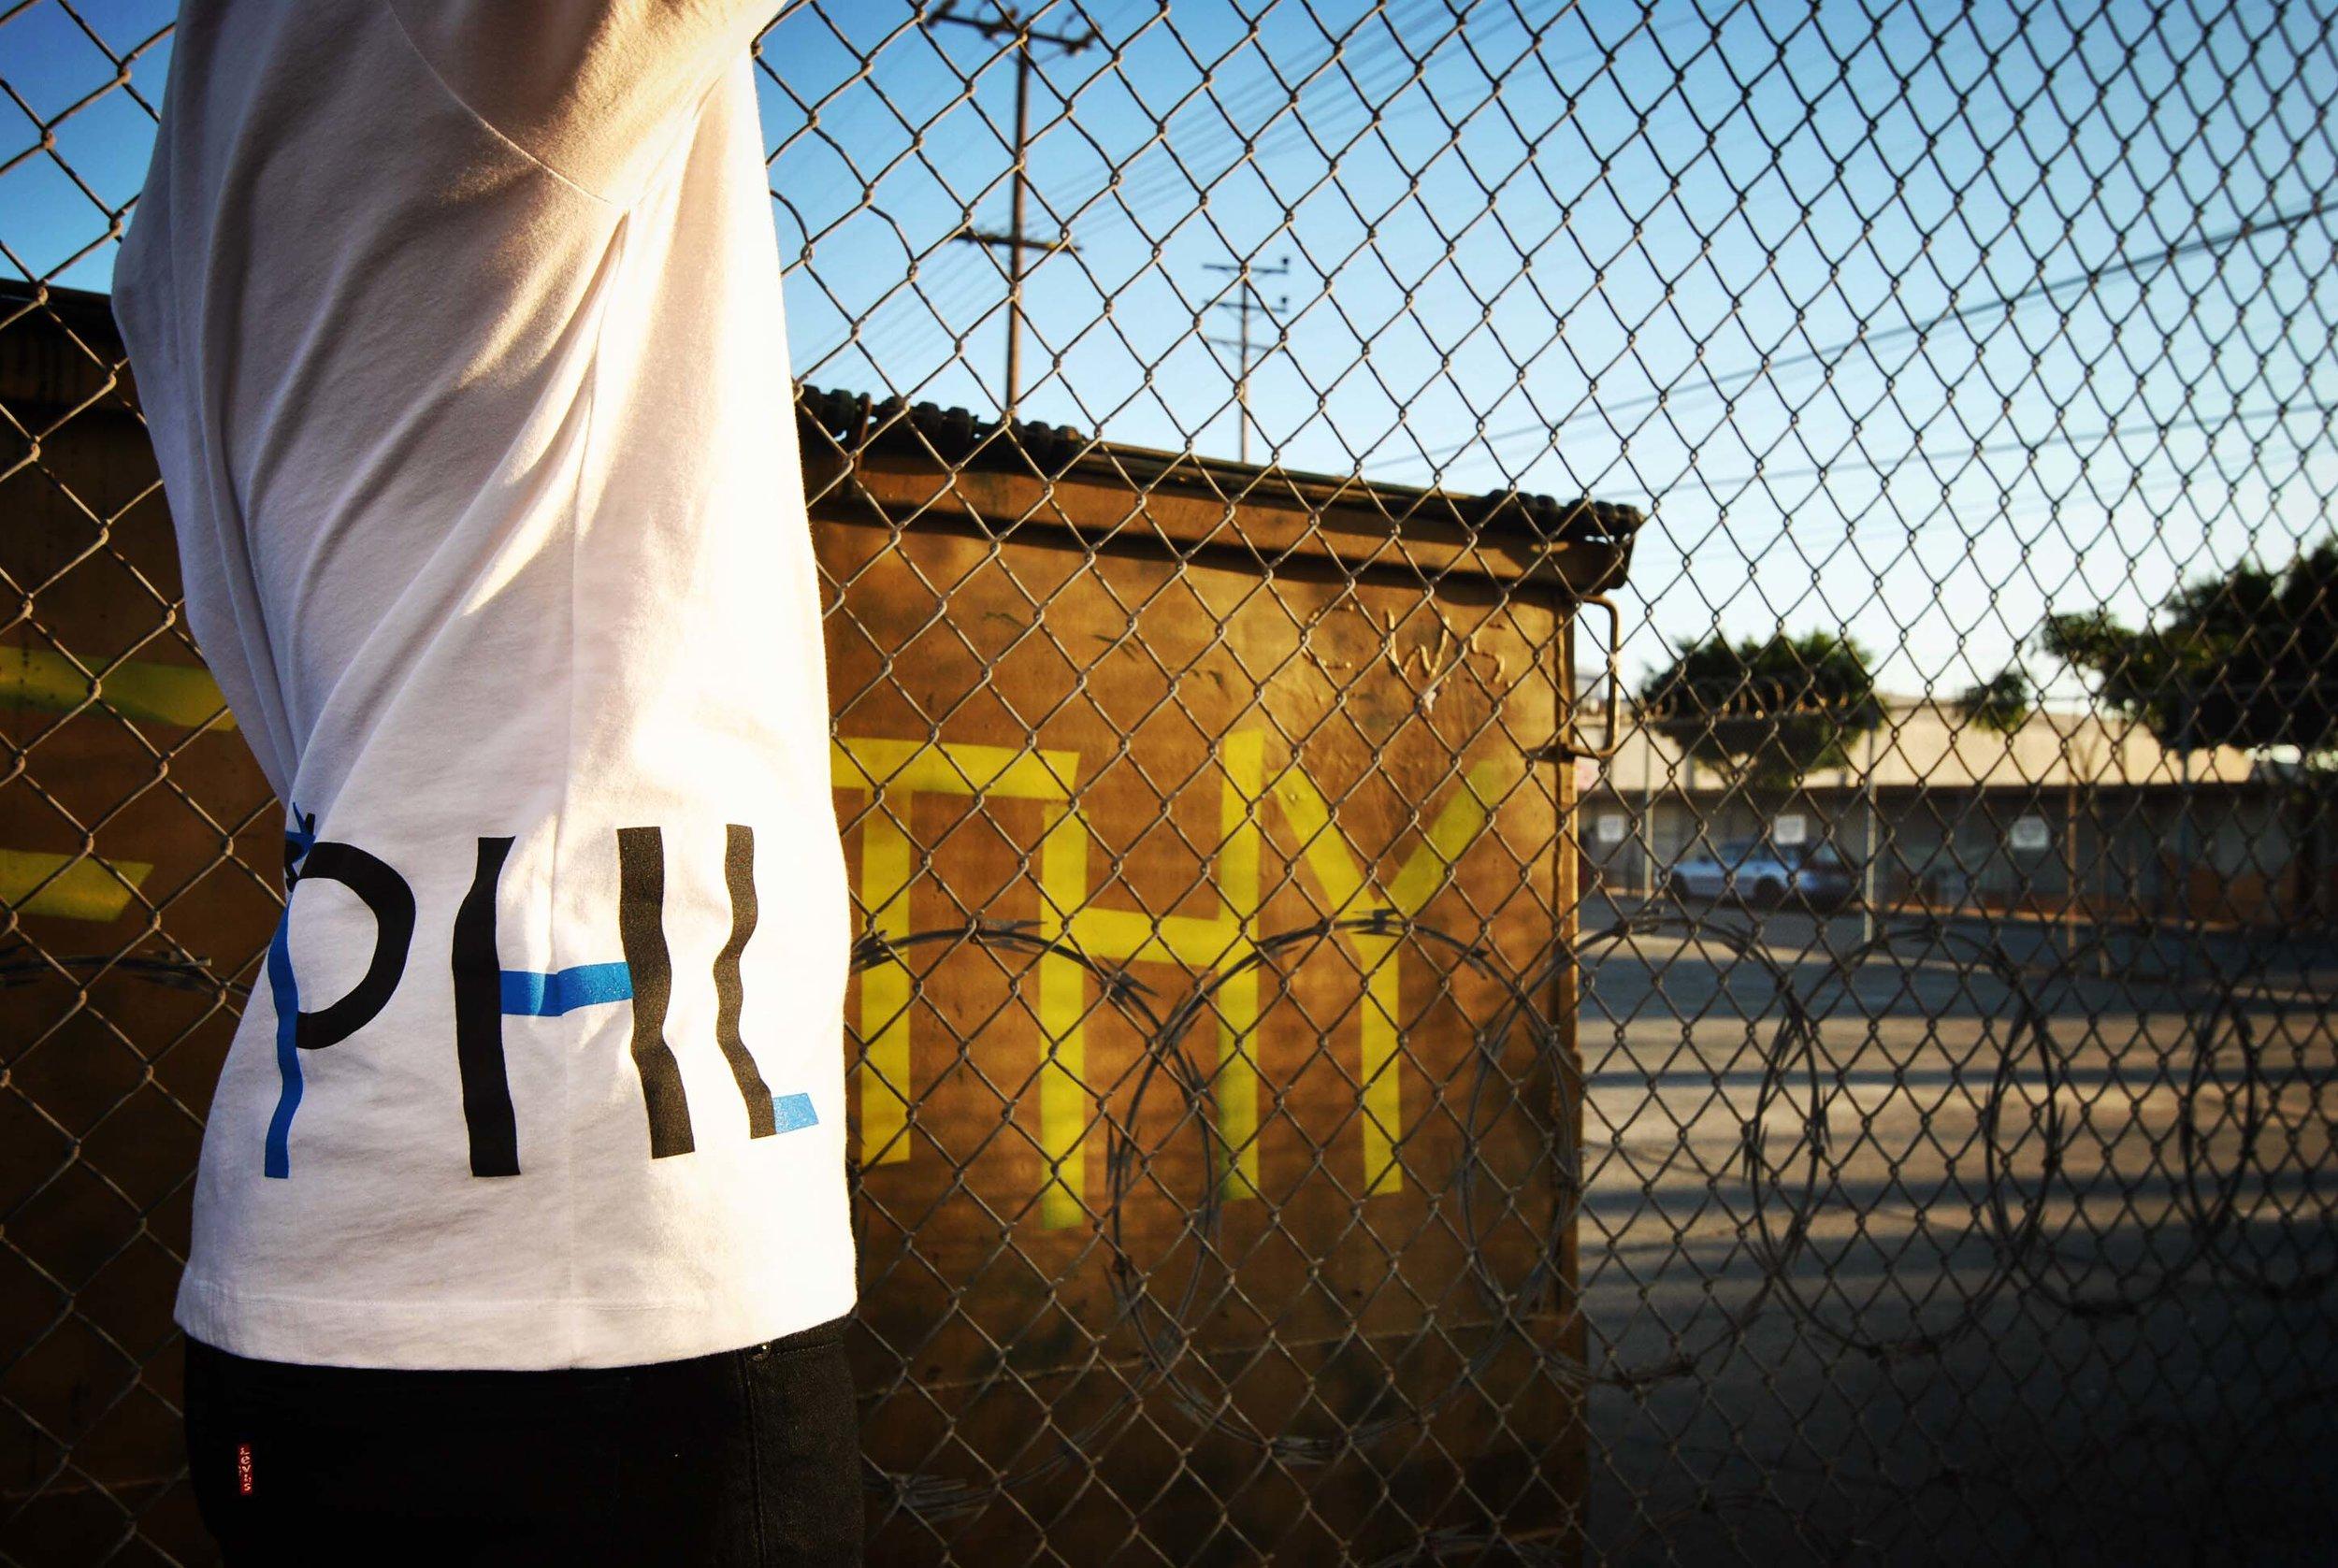 ewkuks streetwear phl lax tee phlthy